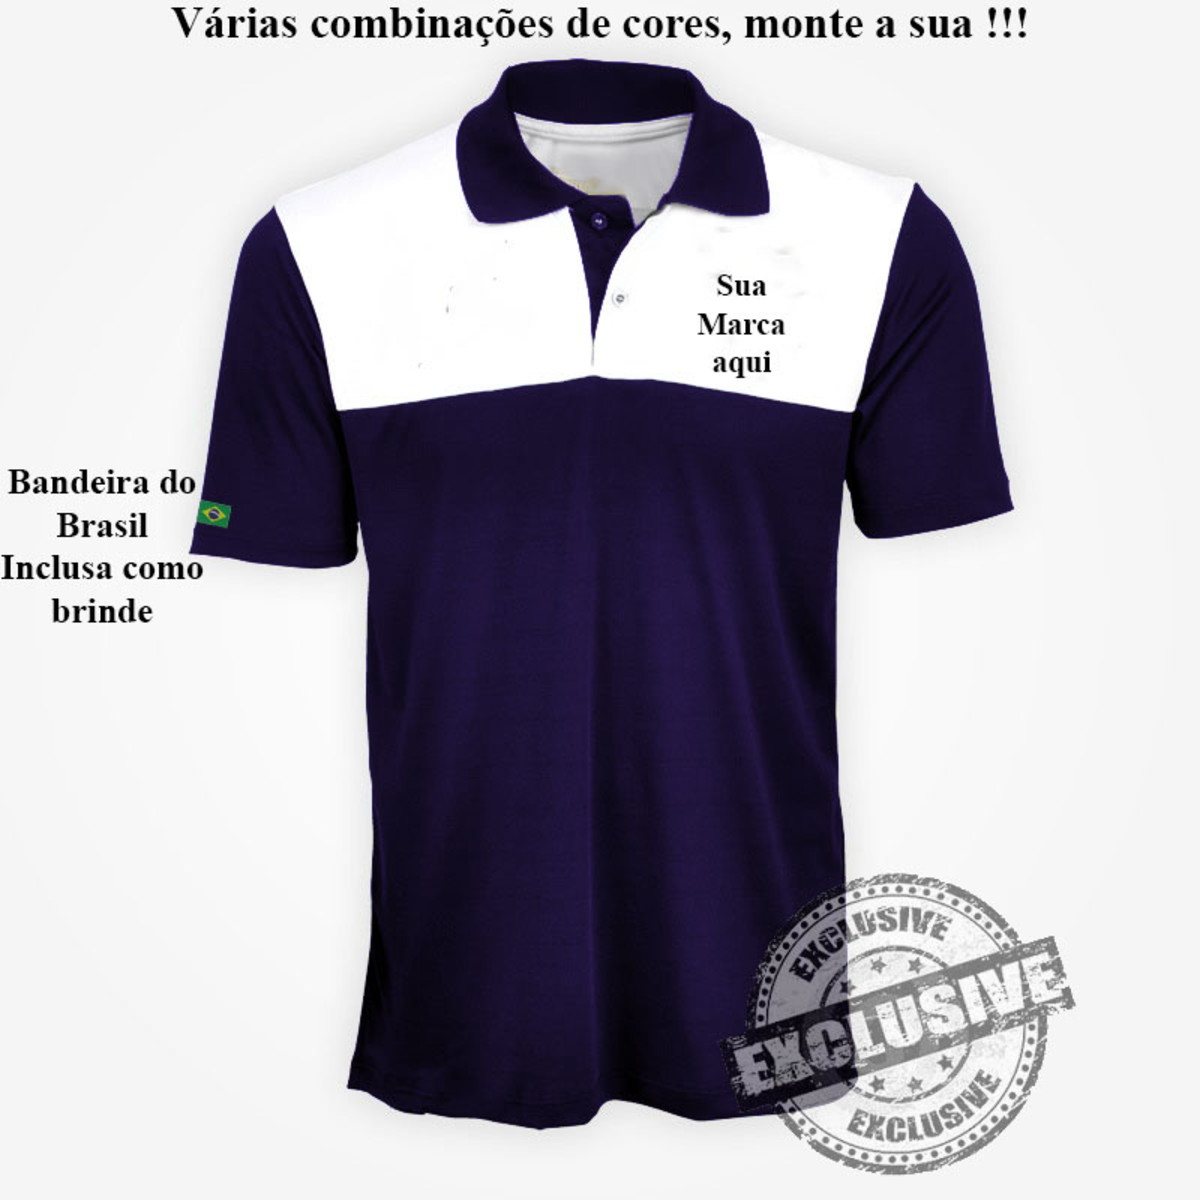 b732384666 Camisa Camiseta pólo uniformes profissionais kit c  4 pçs no Elo7 ...